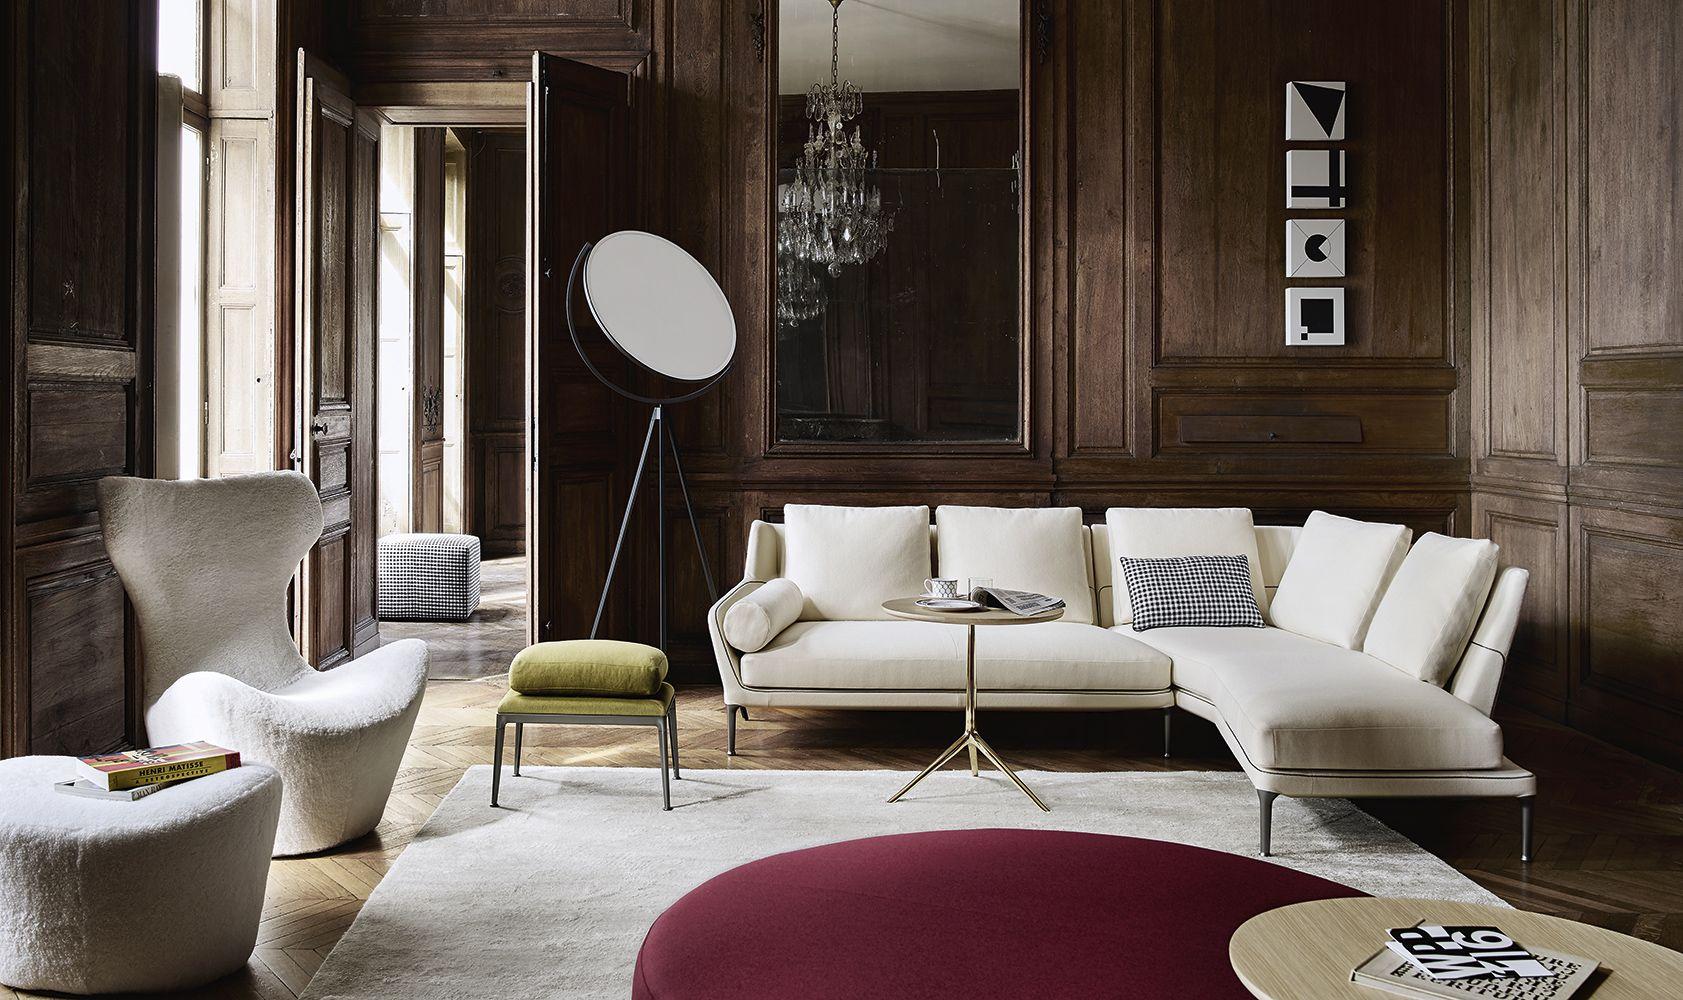 Small table Mirto Indoor B&B Italia - Design de Antonio Citterio ...